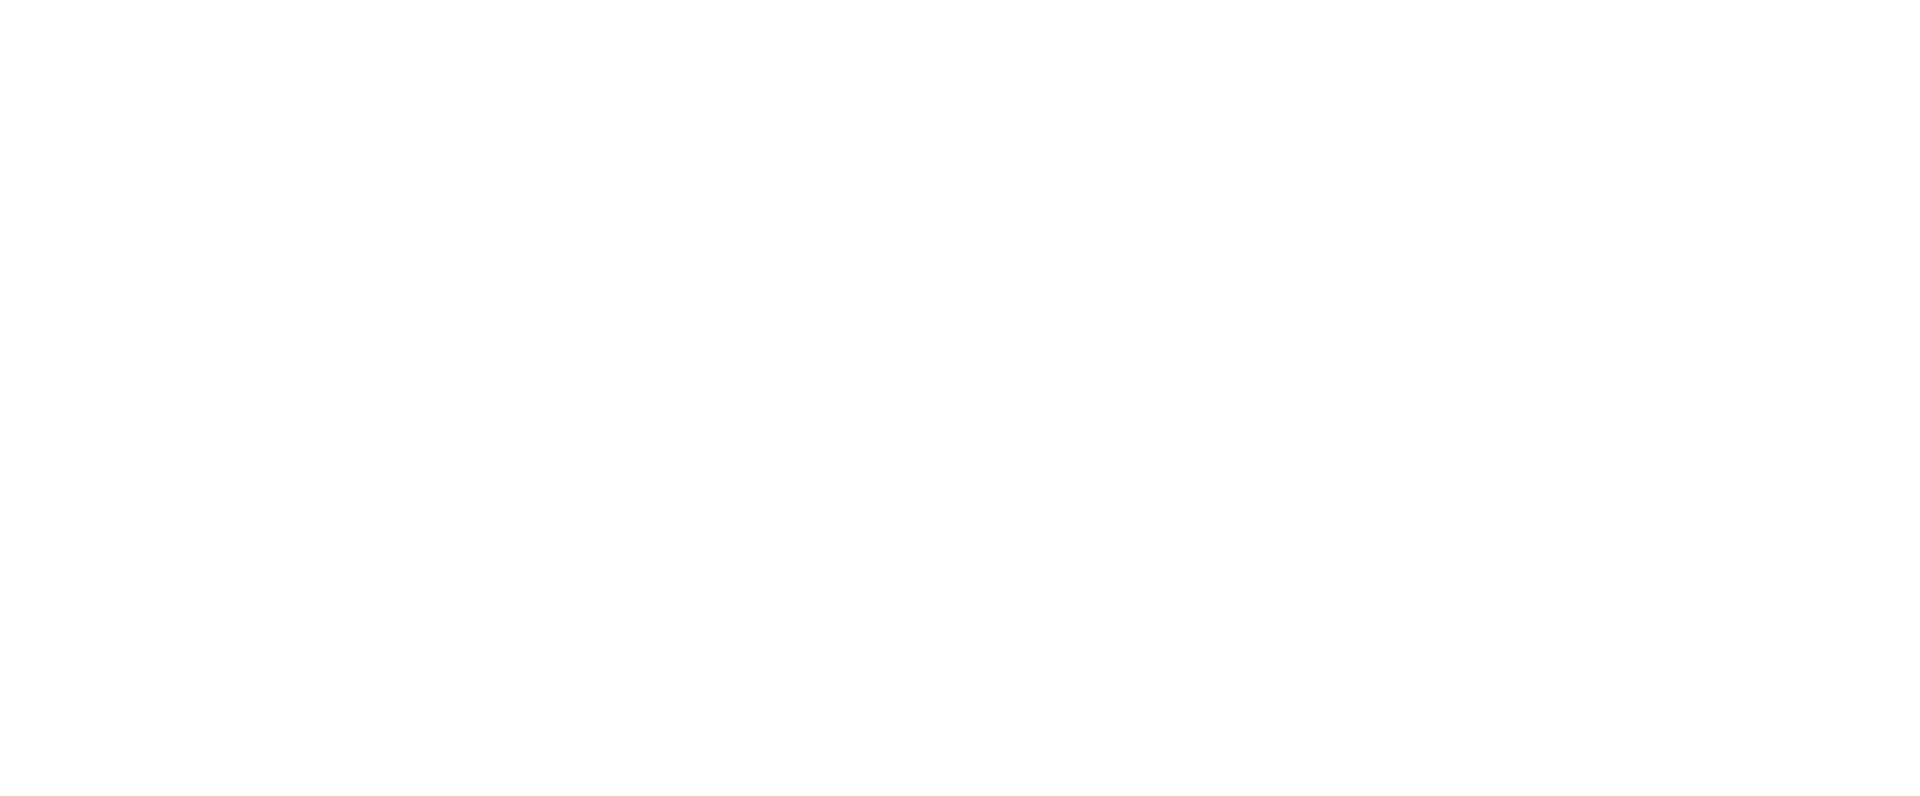 vz-cve